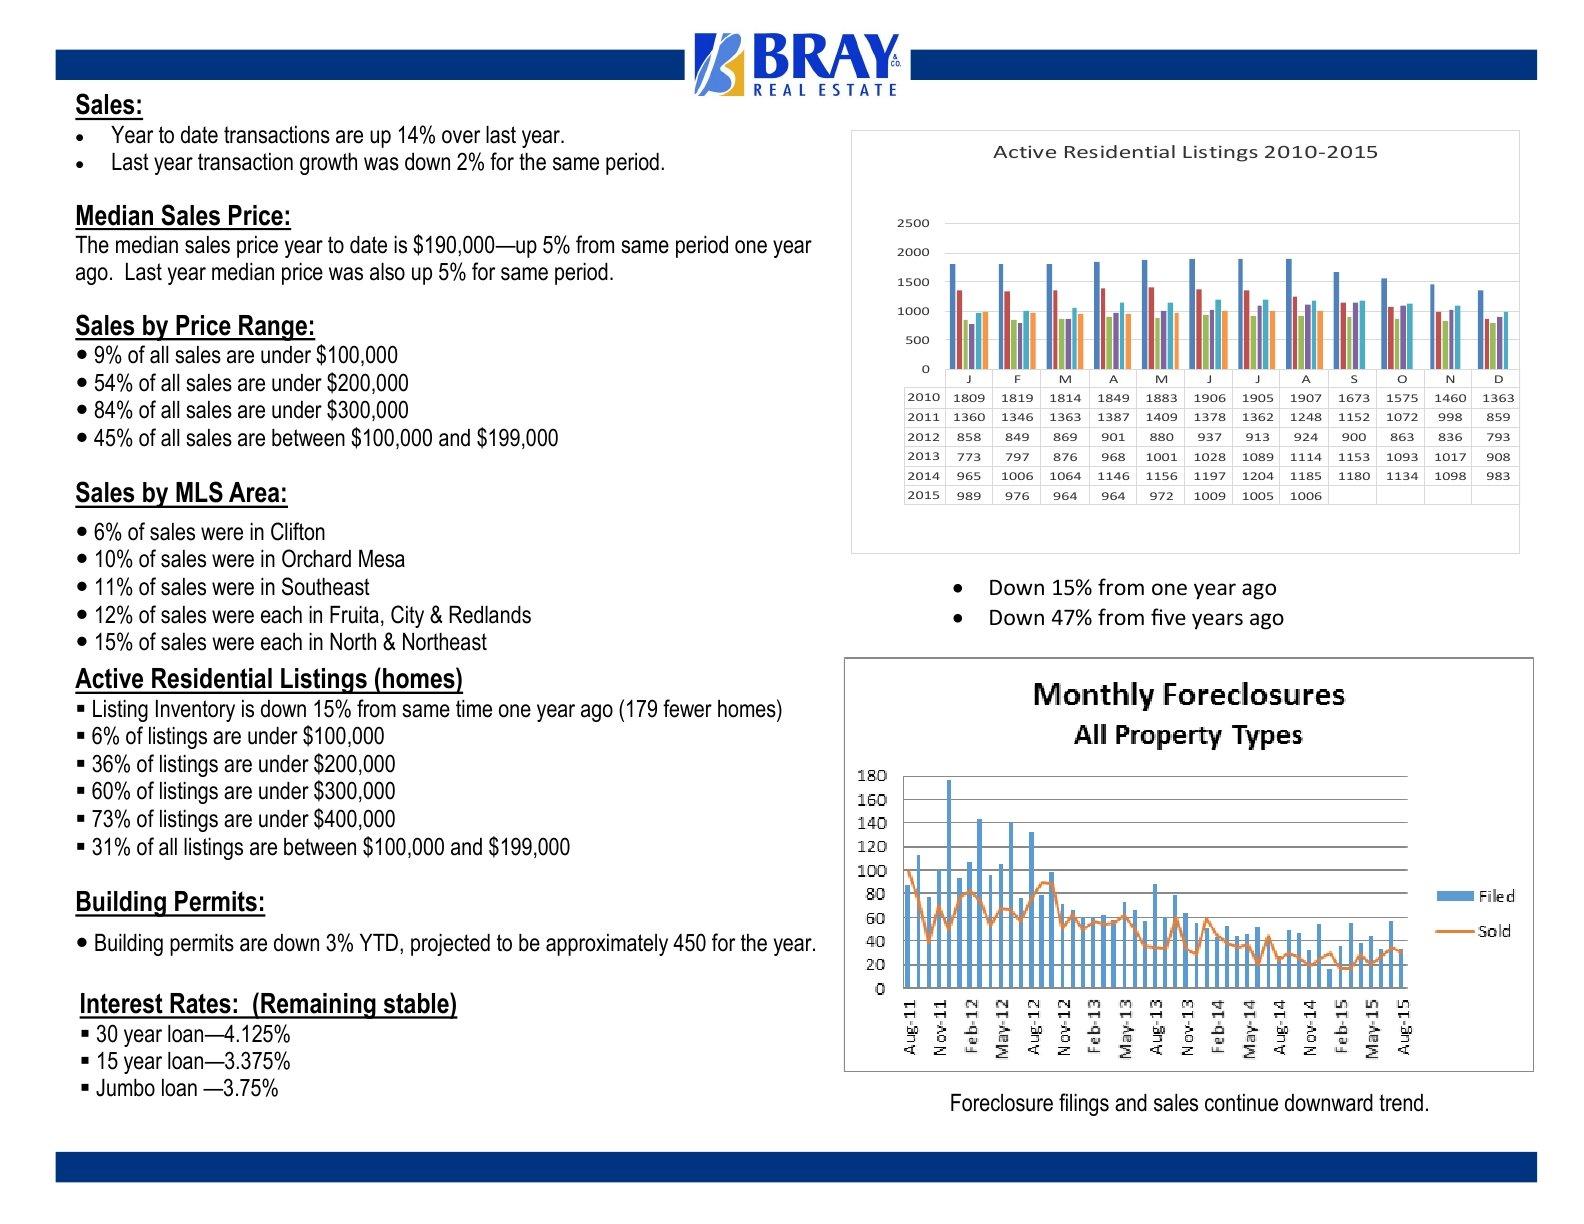 Aug 2015 Bray Report-barb2